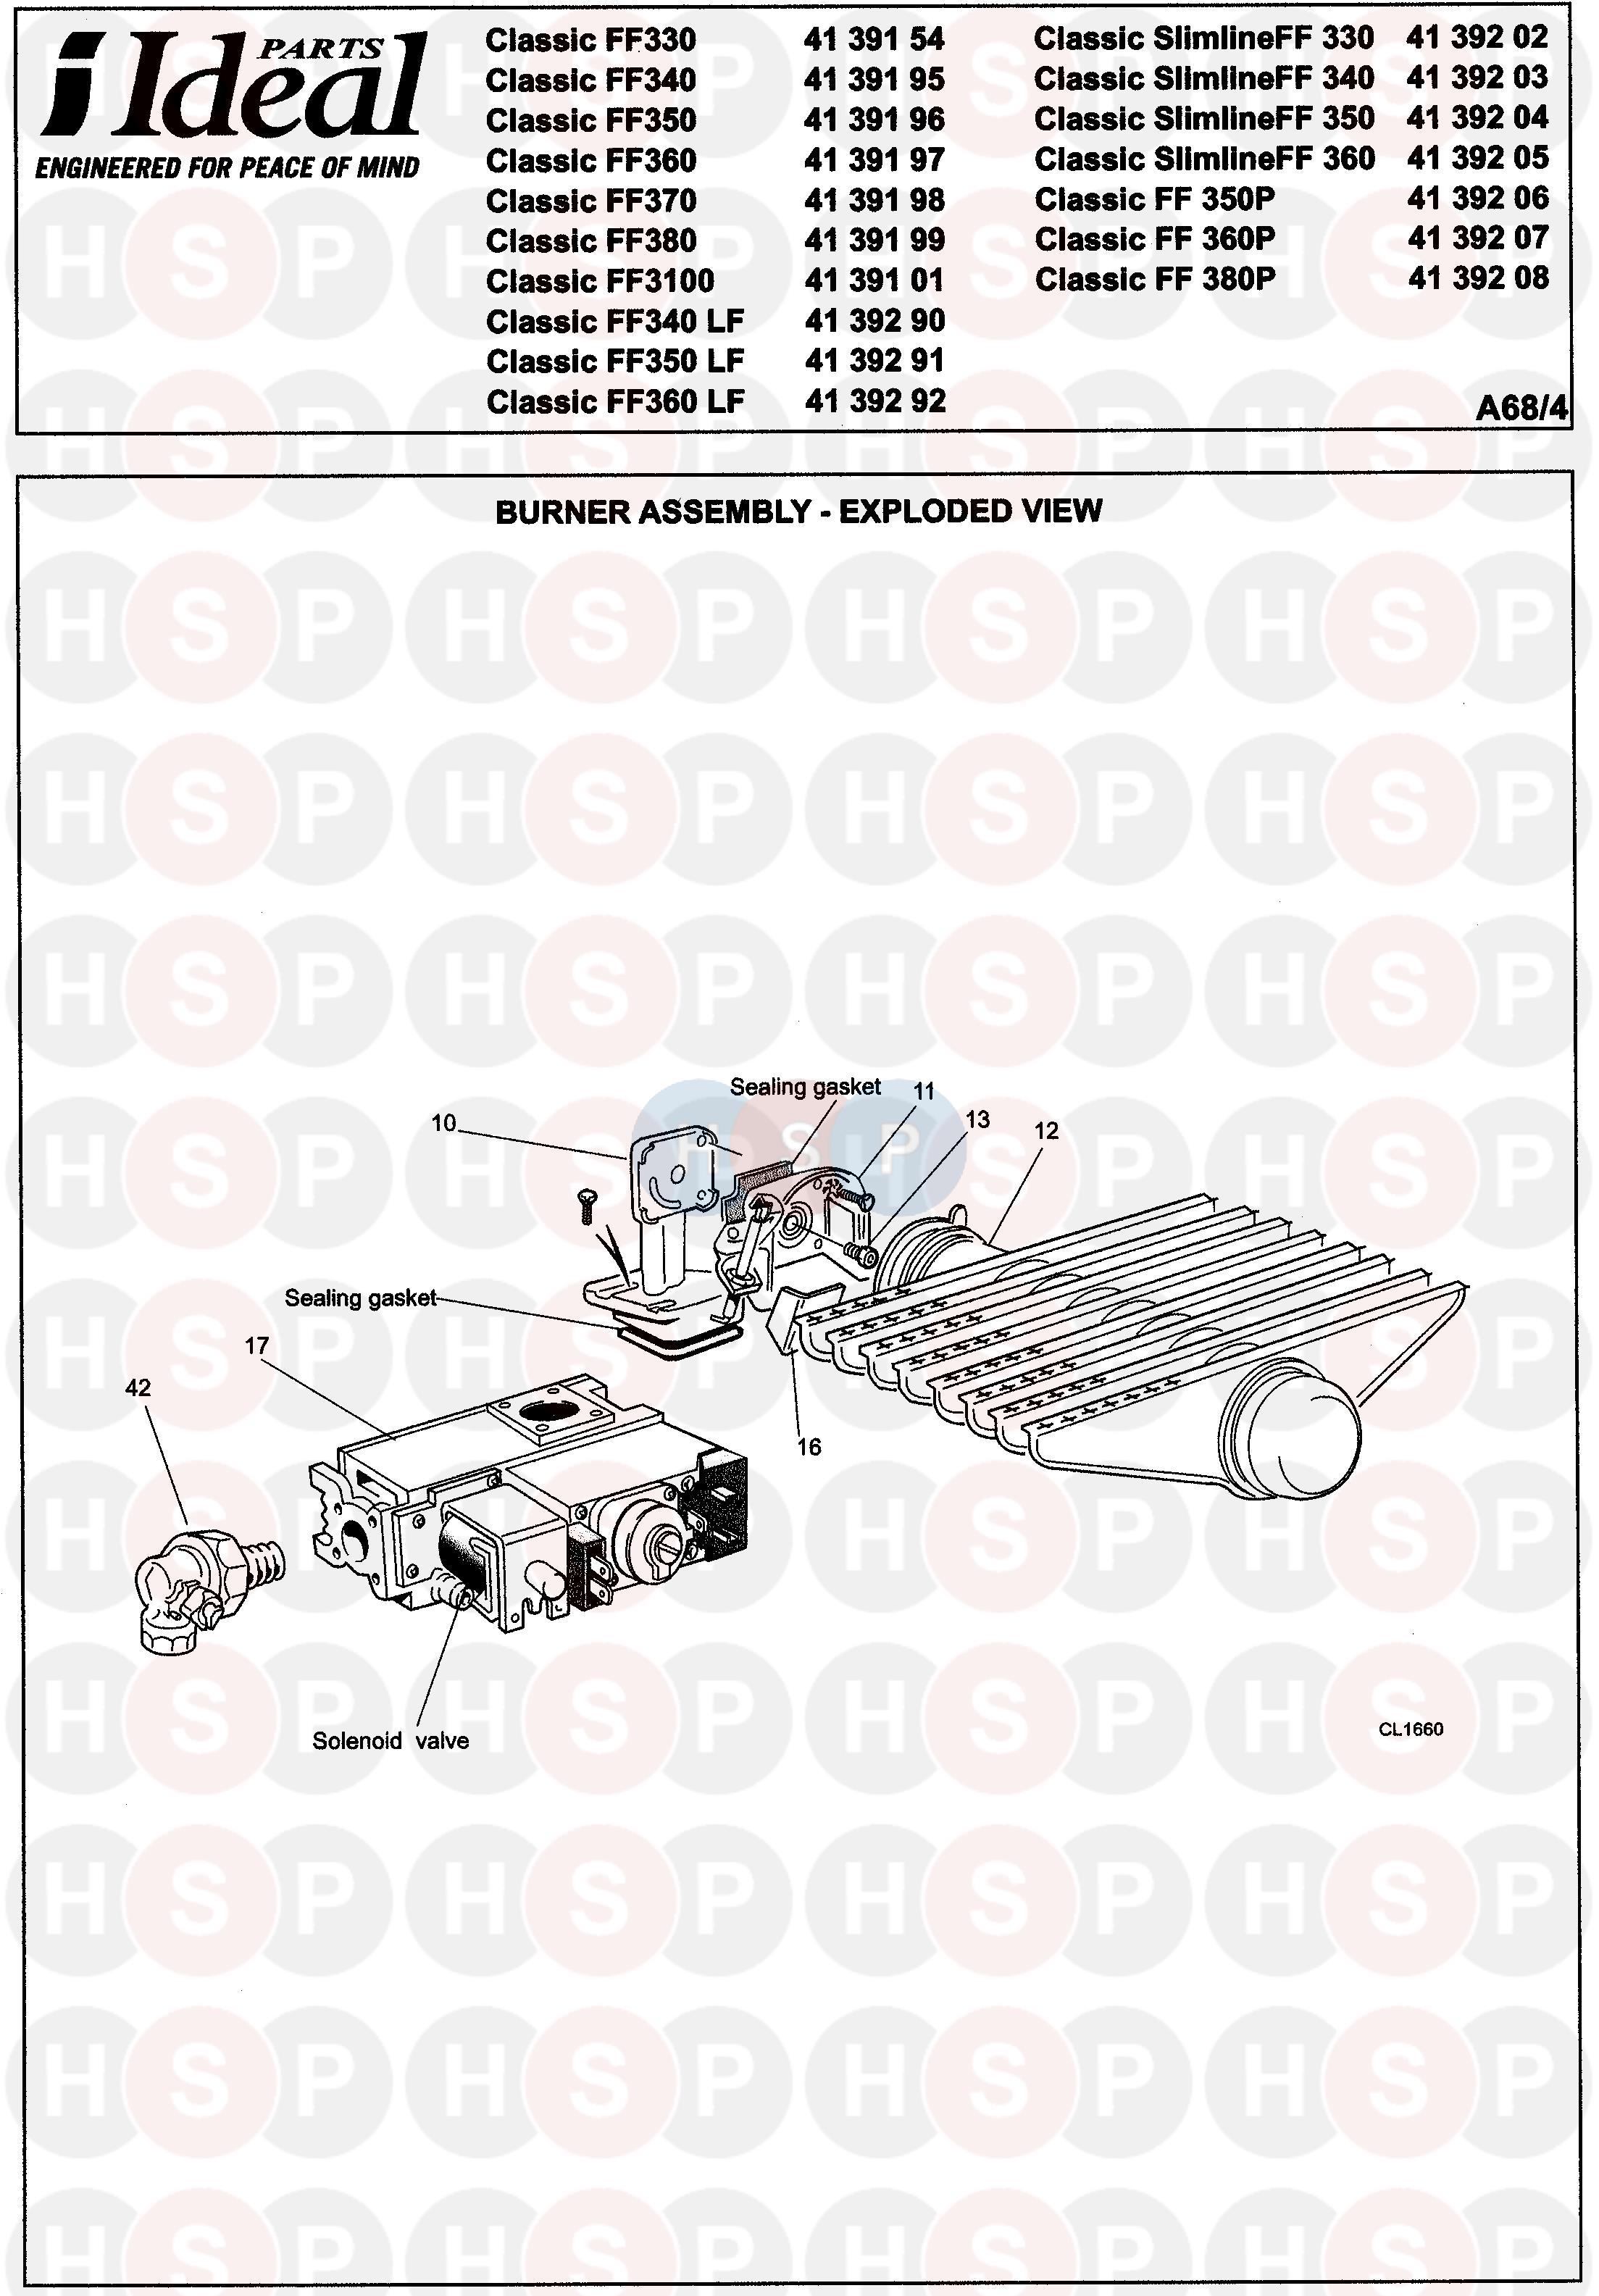 ideal classic ff350  burner  diagram